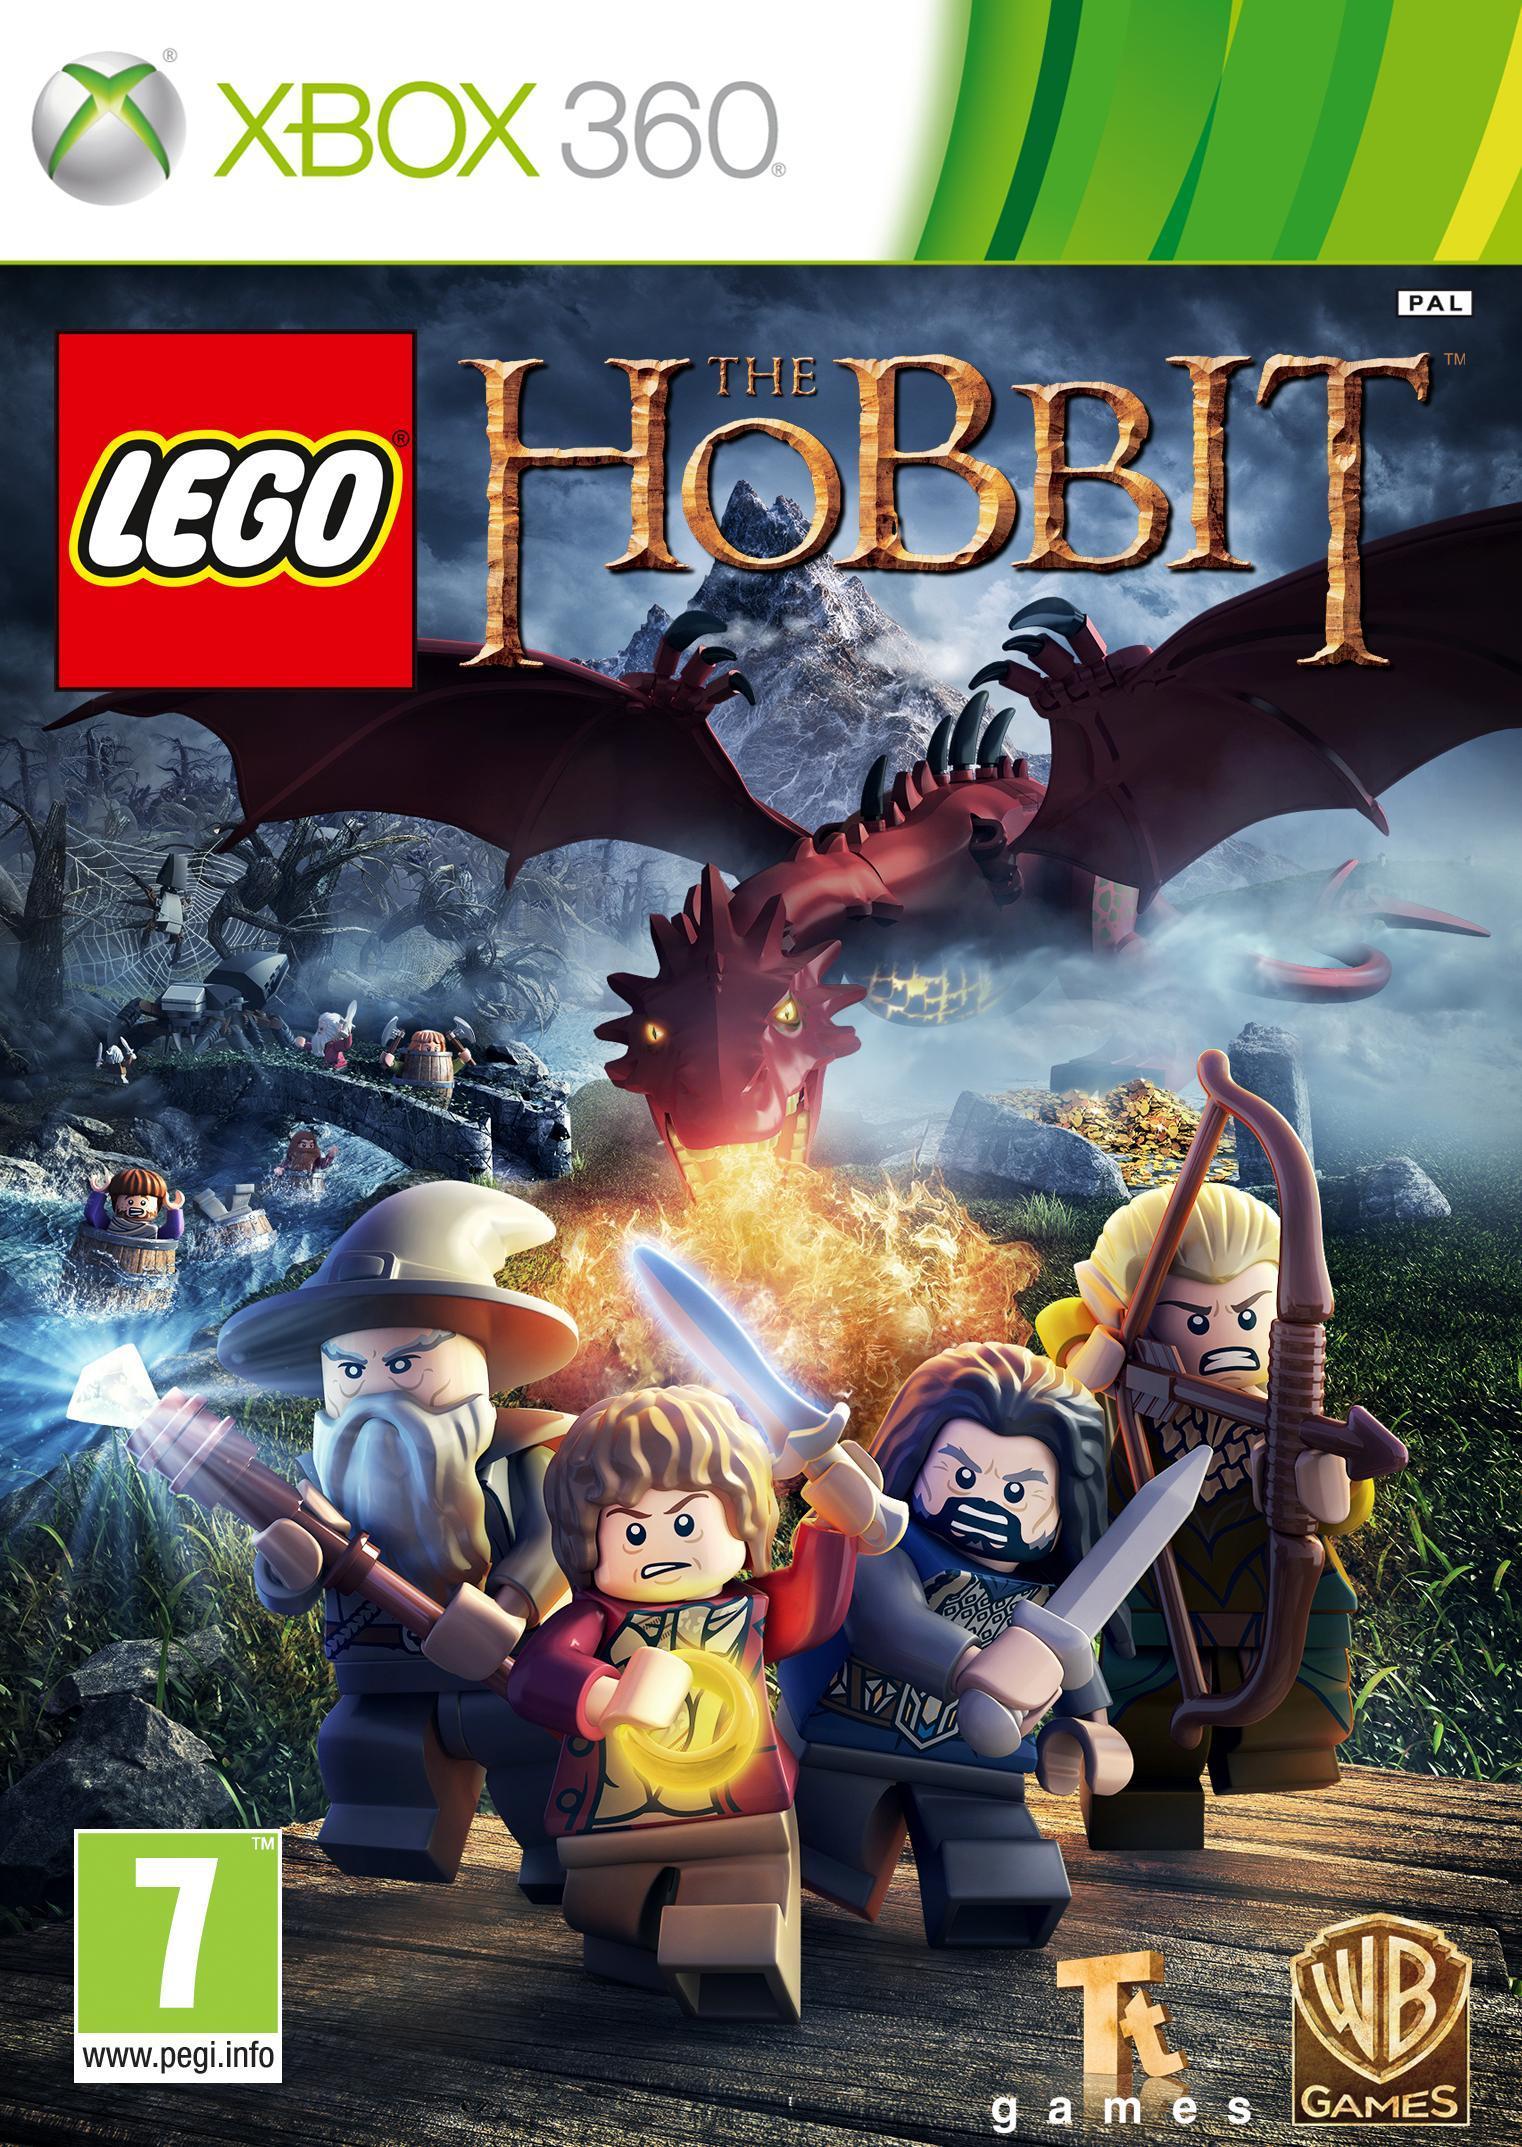 Warner Bros LEGO Hobbit Xbox 360 (1000452203) thumbnail